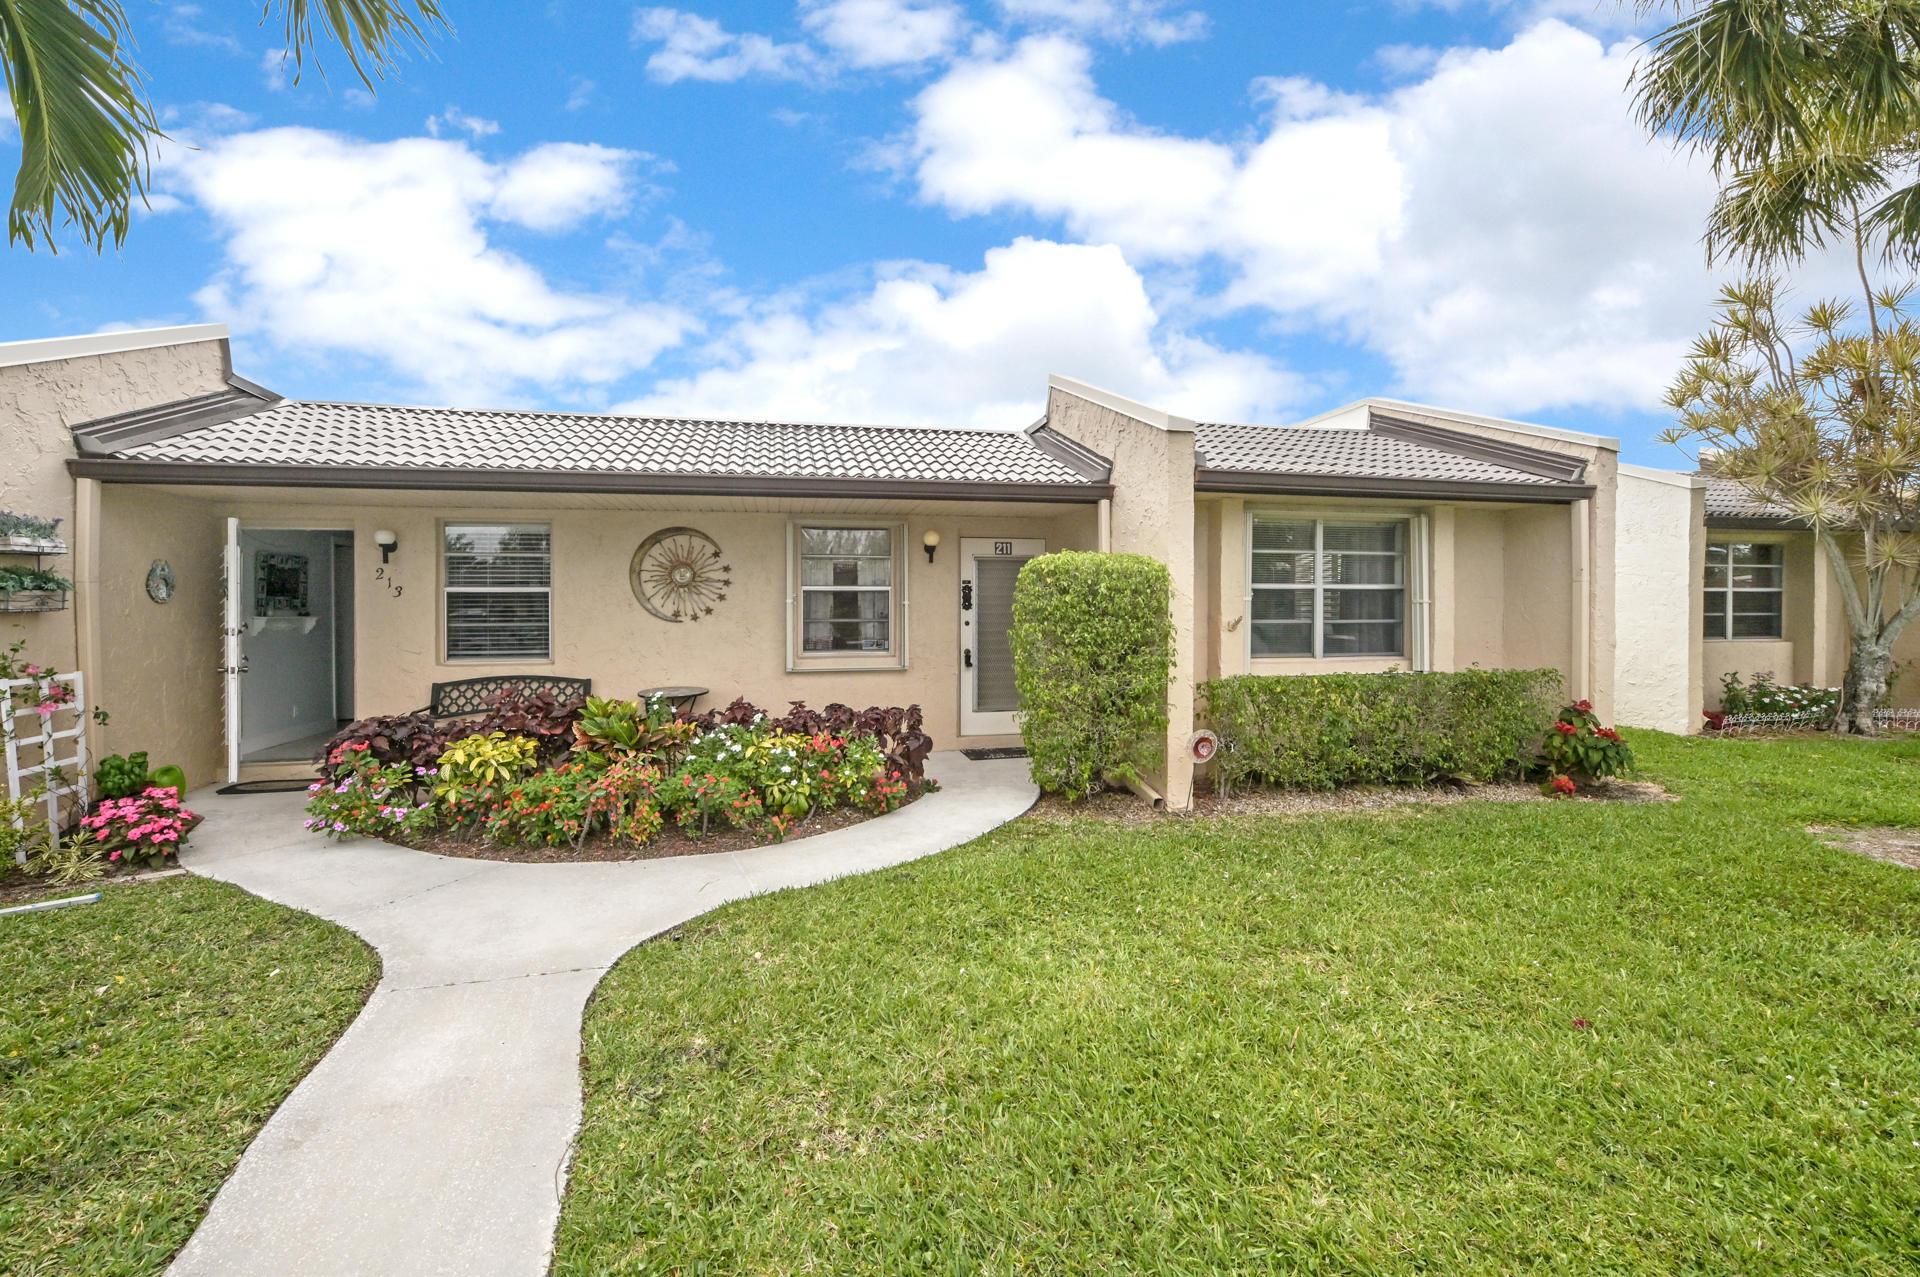 211 Lake Meryl Drive 211 West Palm Beach, FL 33411